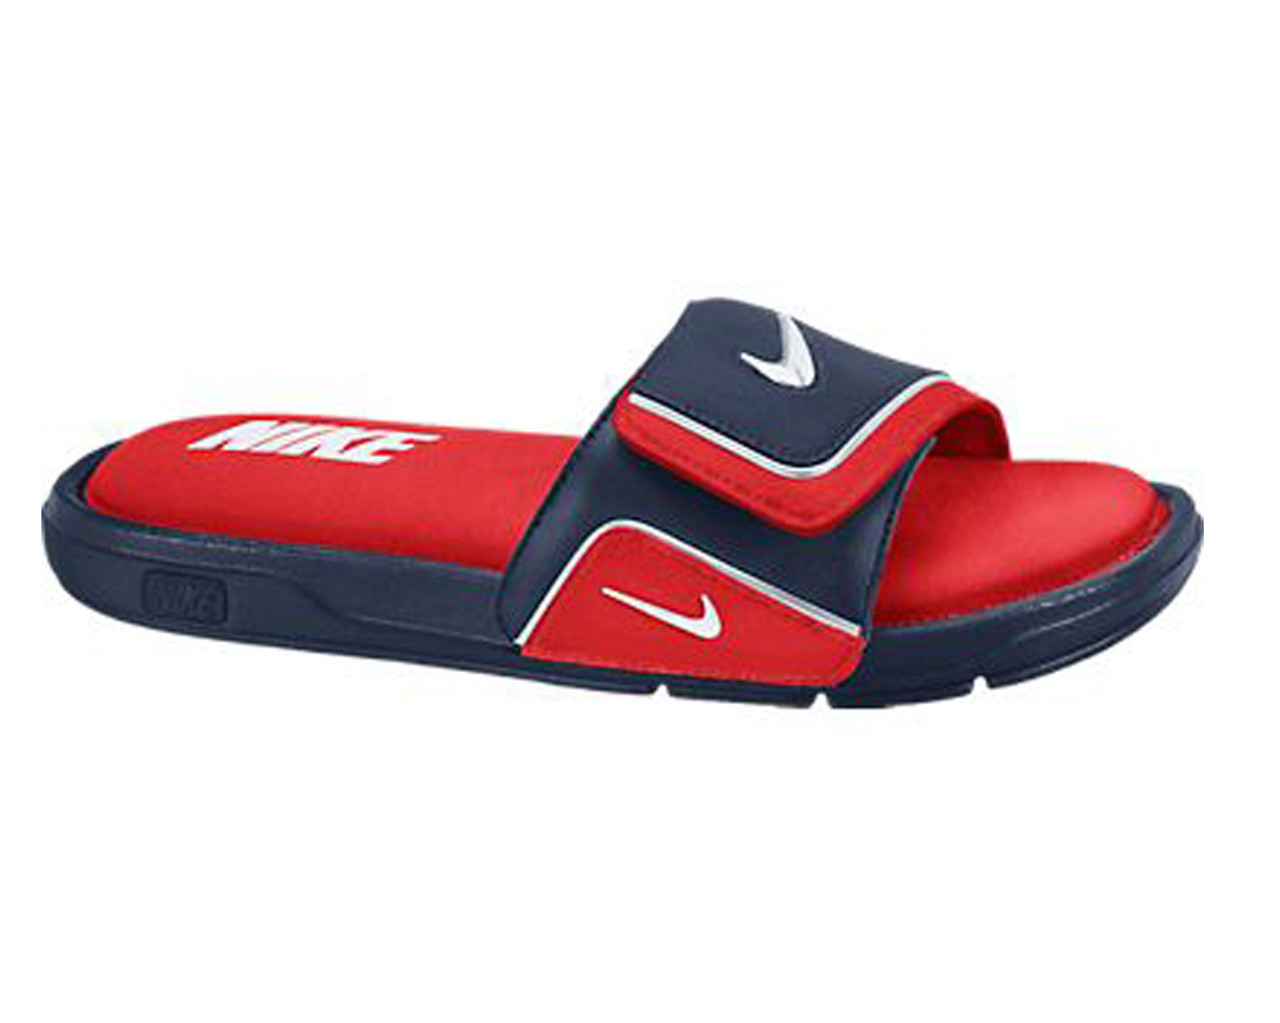 3dac024732fe8f Nike Men s Comfort Slide 2 Sandal Navy Red - Shop now   Shoolu.com